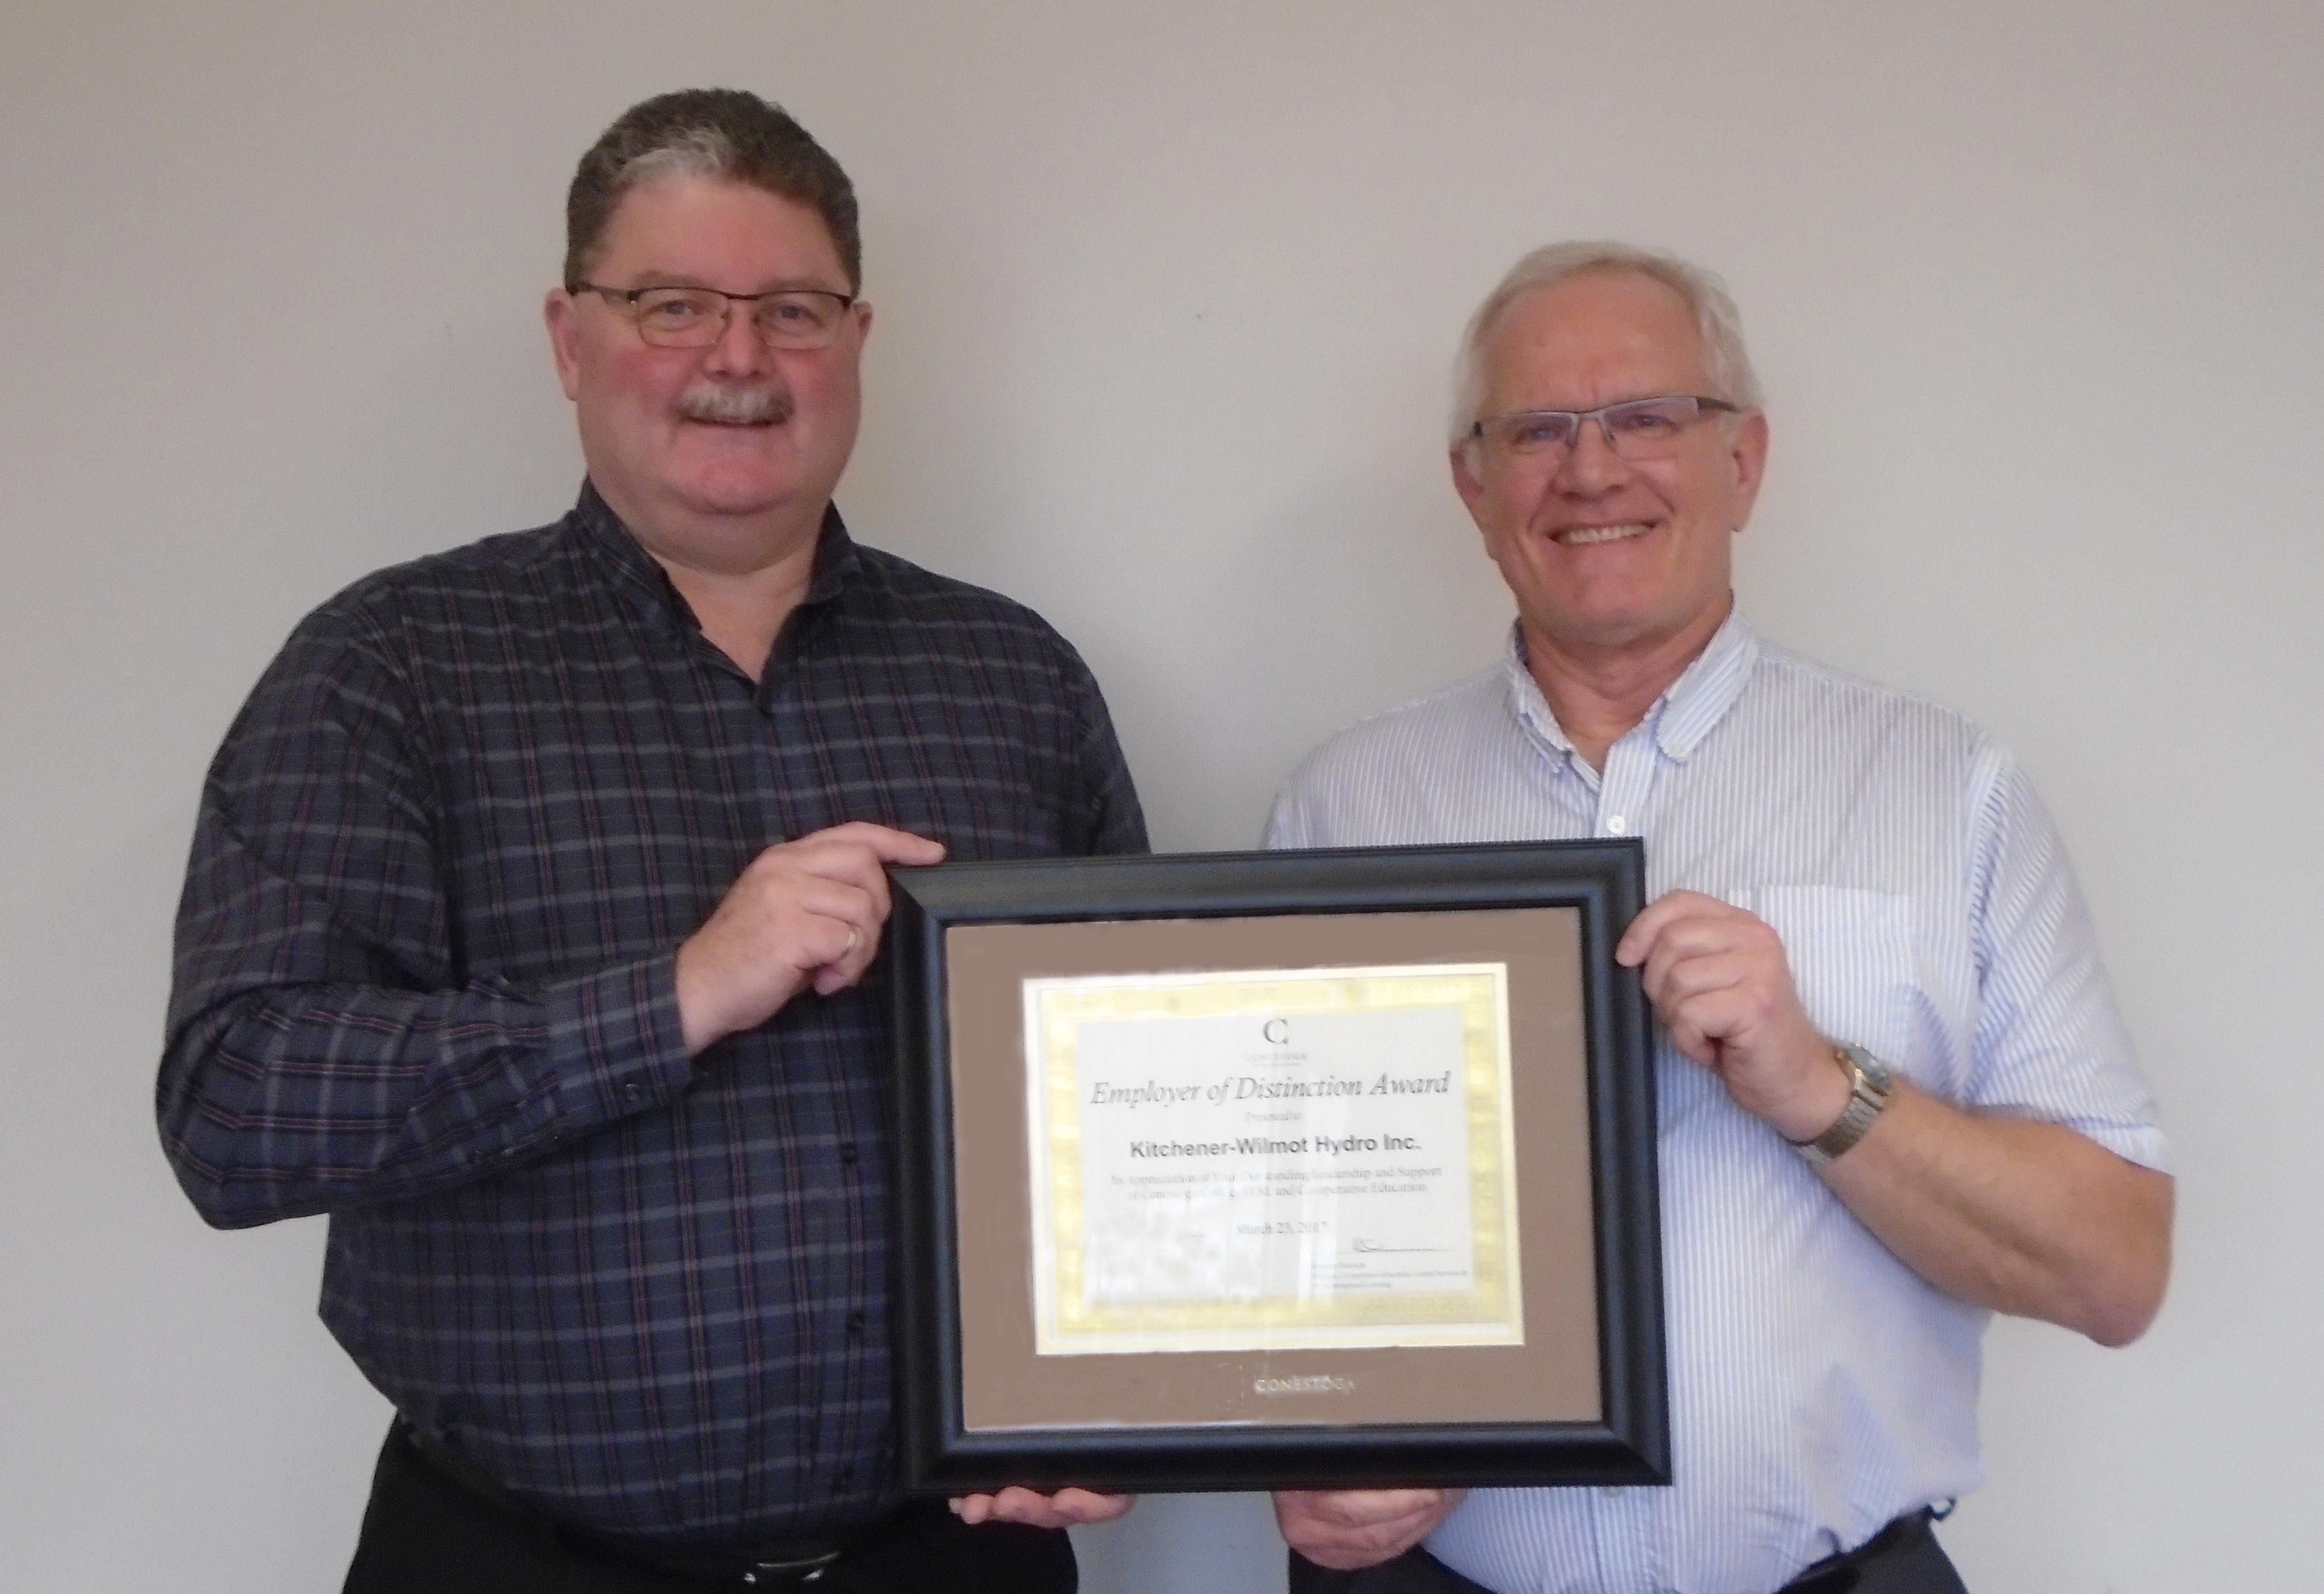 Kitchen er-Wilmot Hydro Employer of Distinction Award